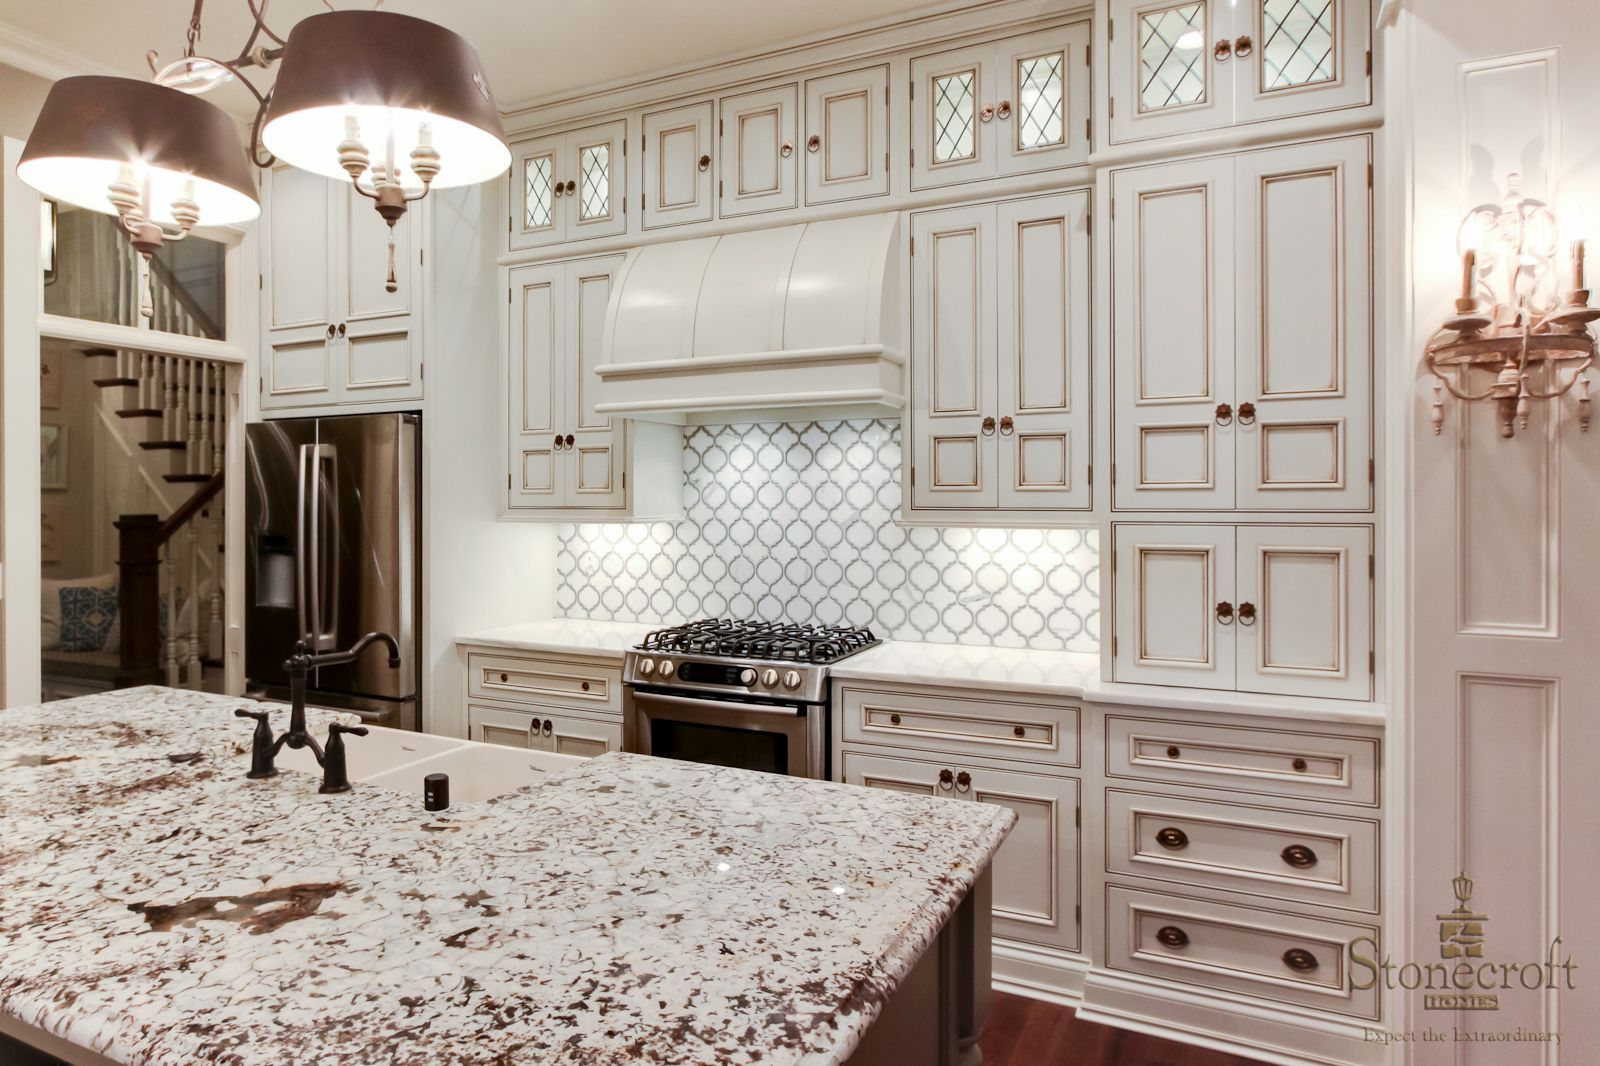 Kitchen Ideas Kitchen Set with Decorative Kitchen Cabinet And. Decoration Ideas For Kitchen Walls. Best 20 Kitchen Wall Art Ideas Onkitchen Art. Wholesale 3 Piece Fruit Wall Art Decor Painting Home Kitchen